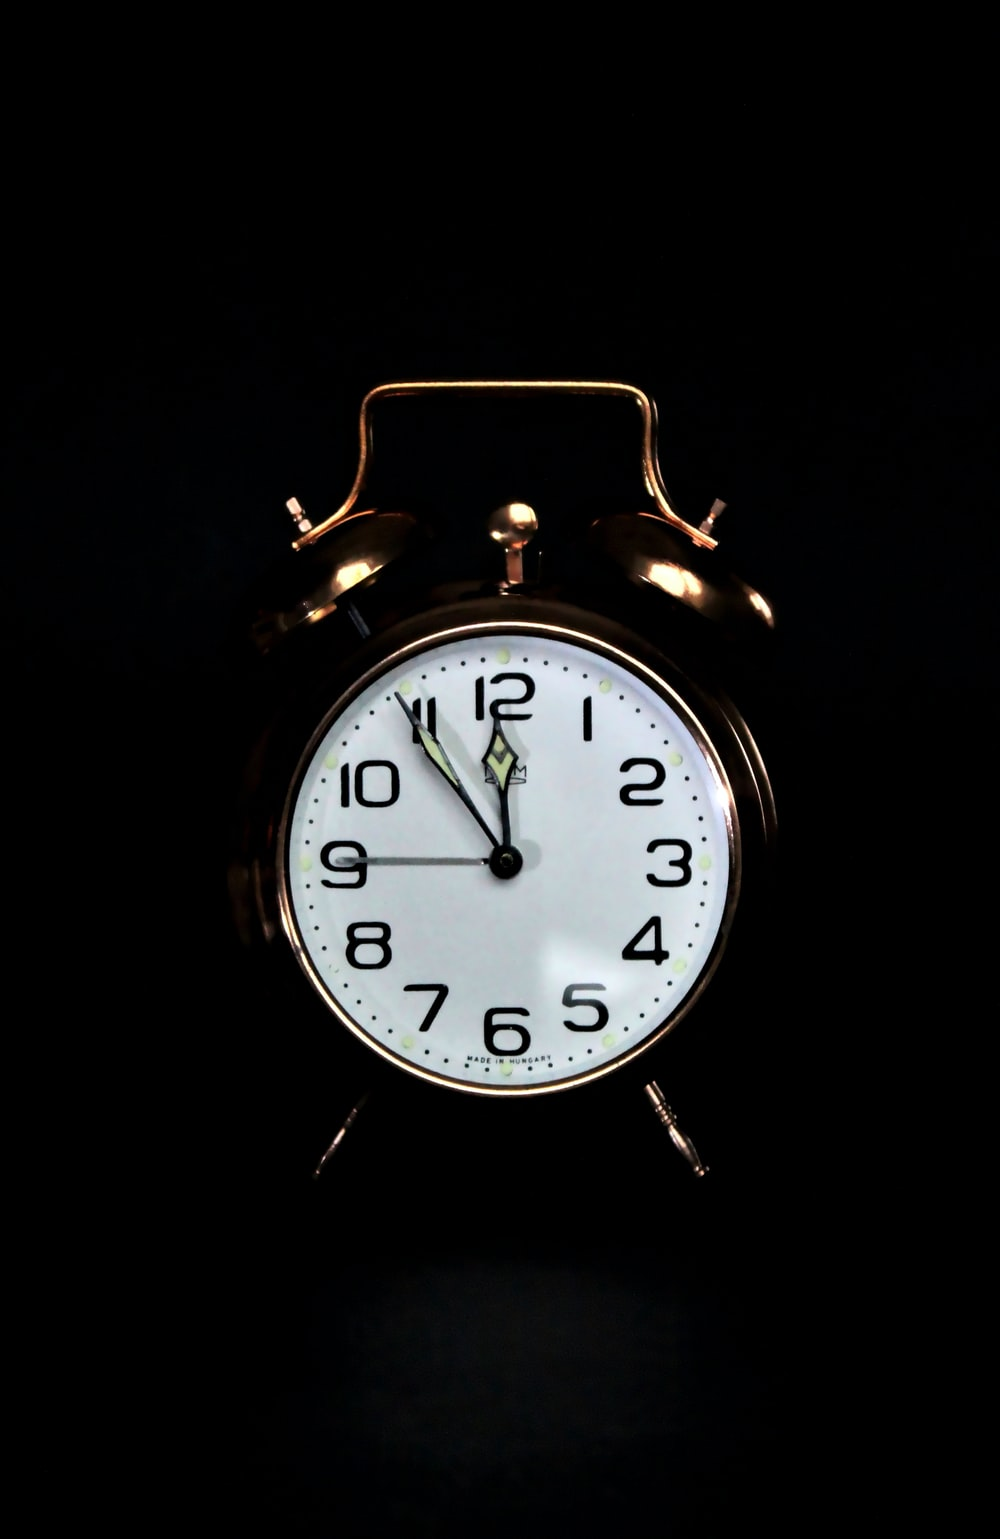 black and white analog alarm clock